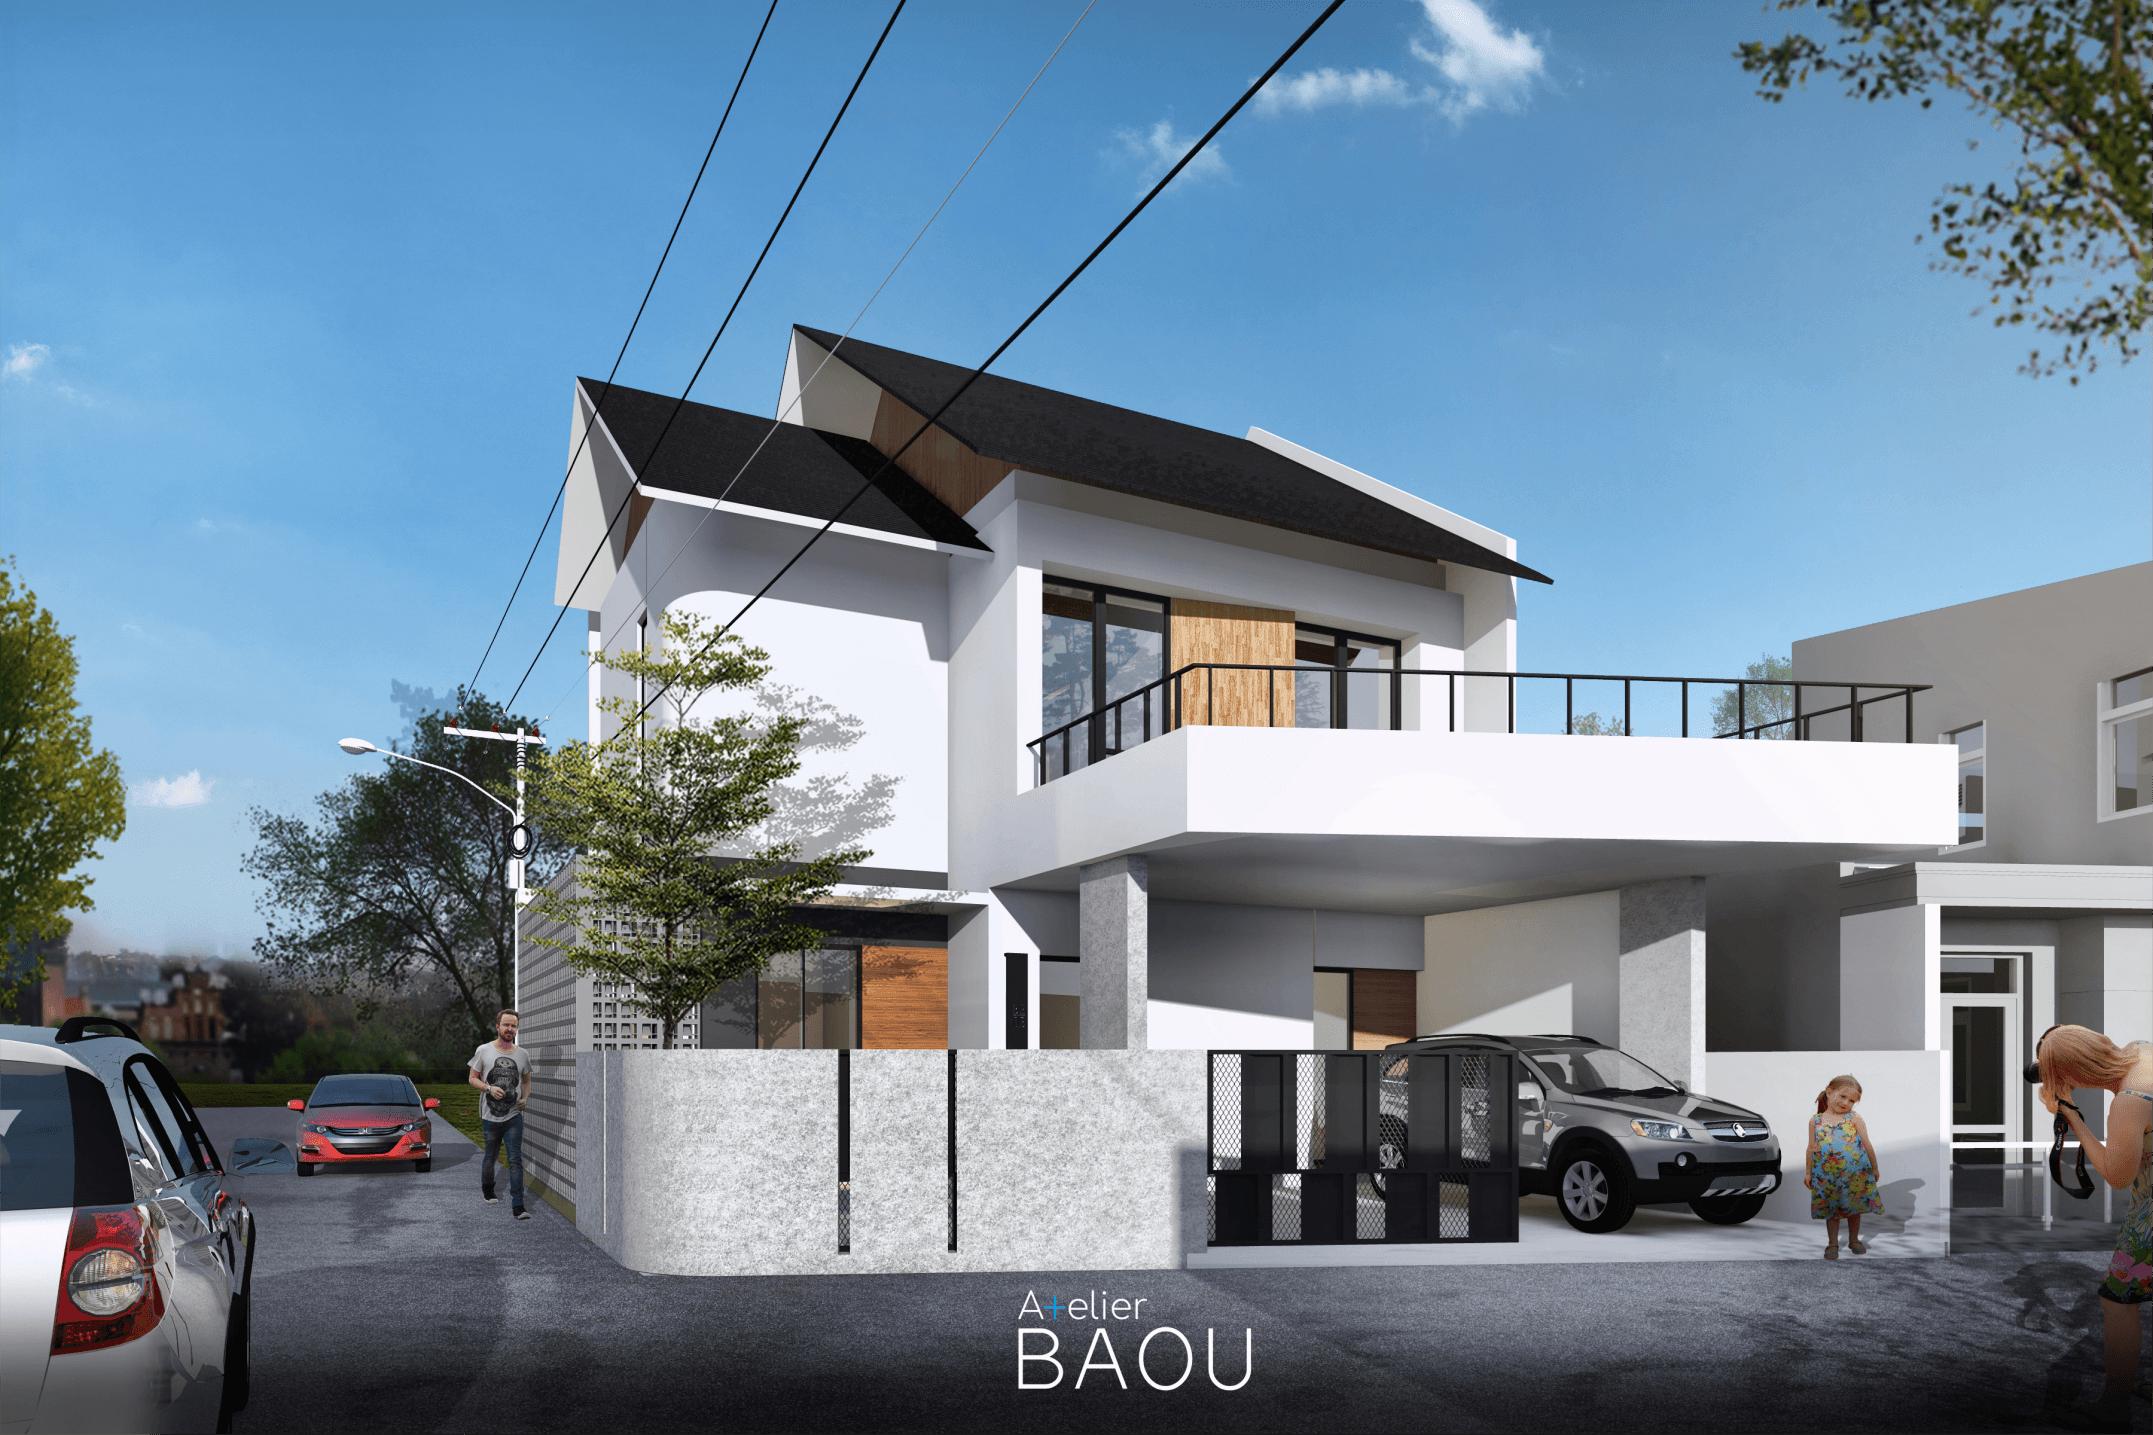 Atelier Baou Yt House Tangerang, Kota Tangerang, Banten, Indonesia Tangerang, Kota Tangerang, Banten, Indonesia Atelier-Baou-Yt-House  86494